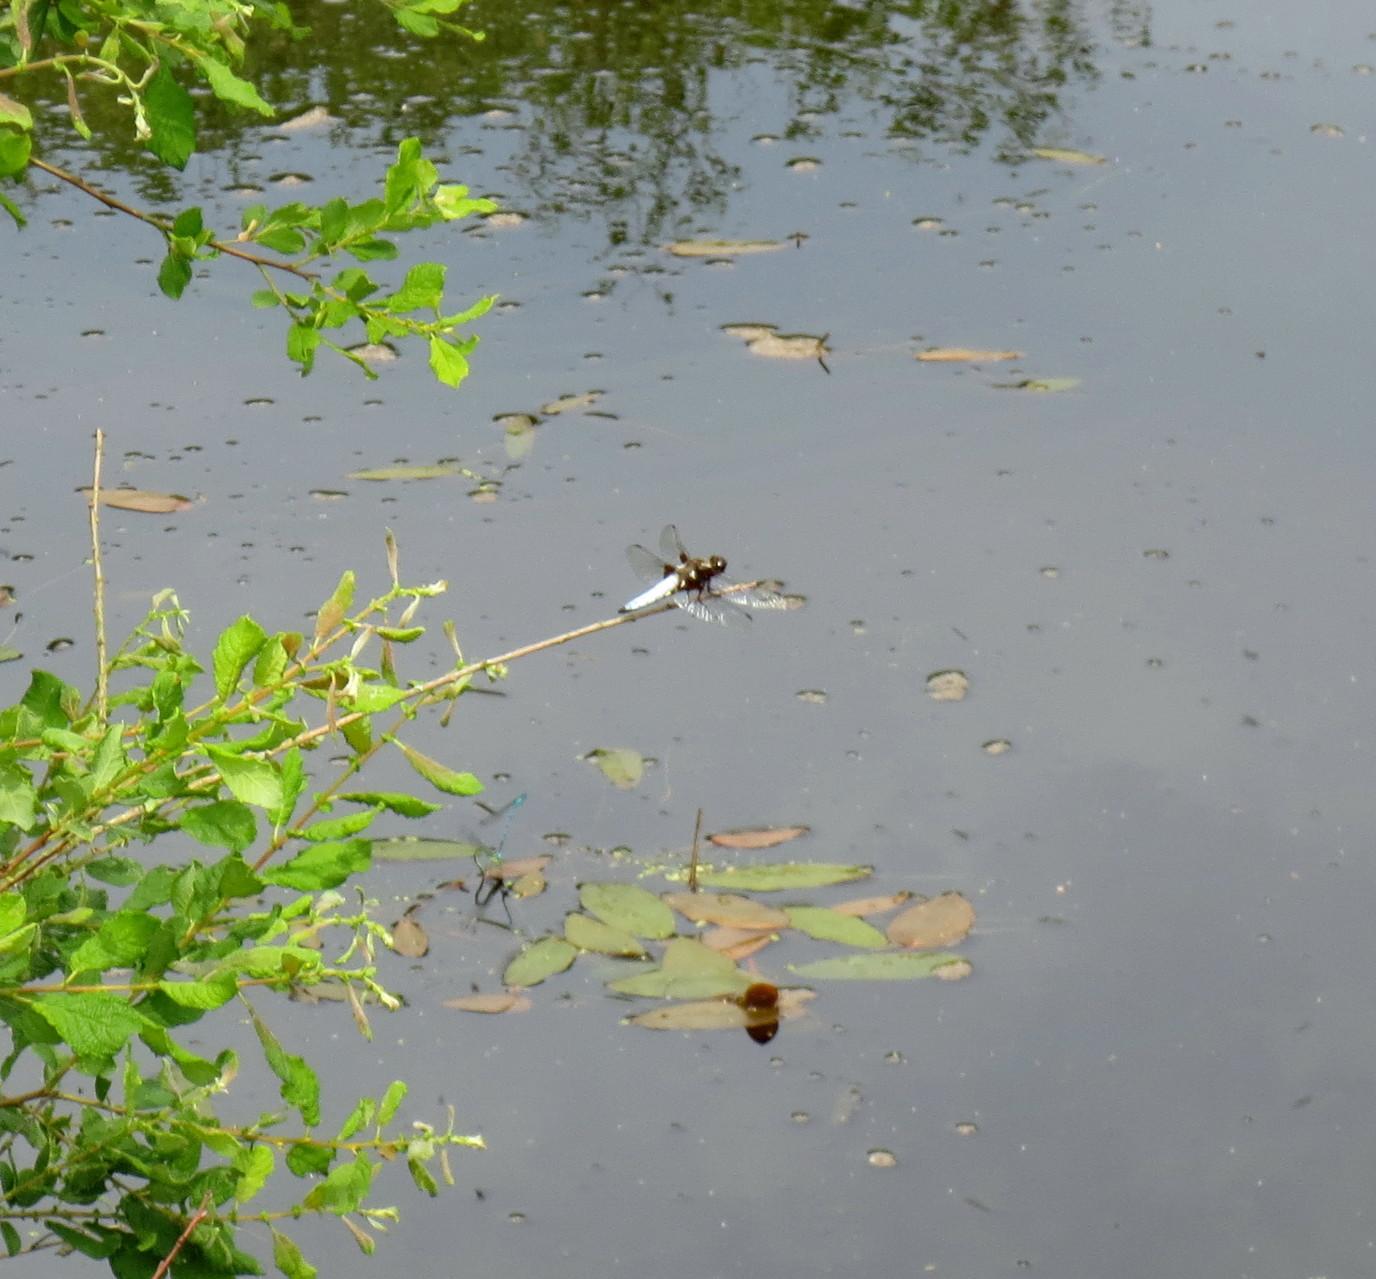 Plattbauch (Libellula depressa), Männchen 8. Juni 2014